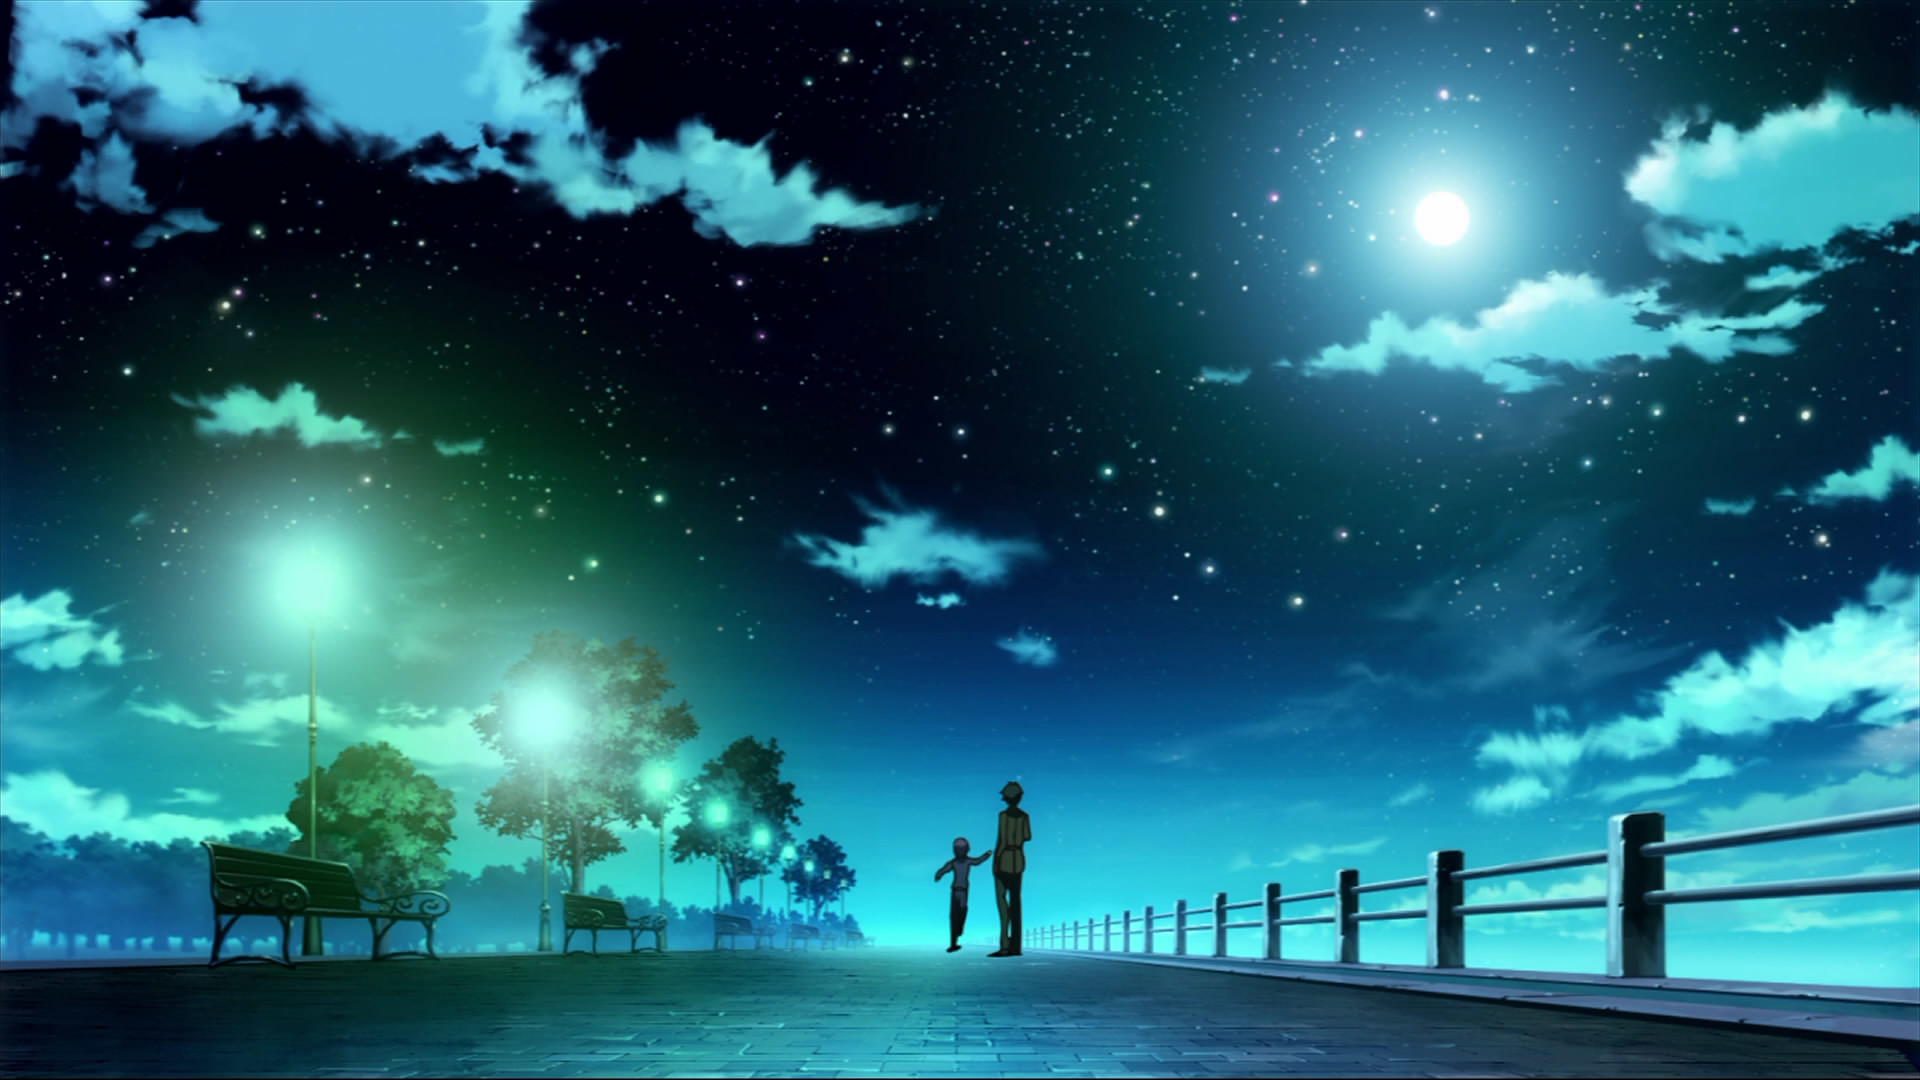 justpict.com Anime Night Sky Wallpaper